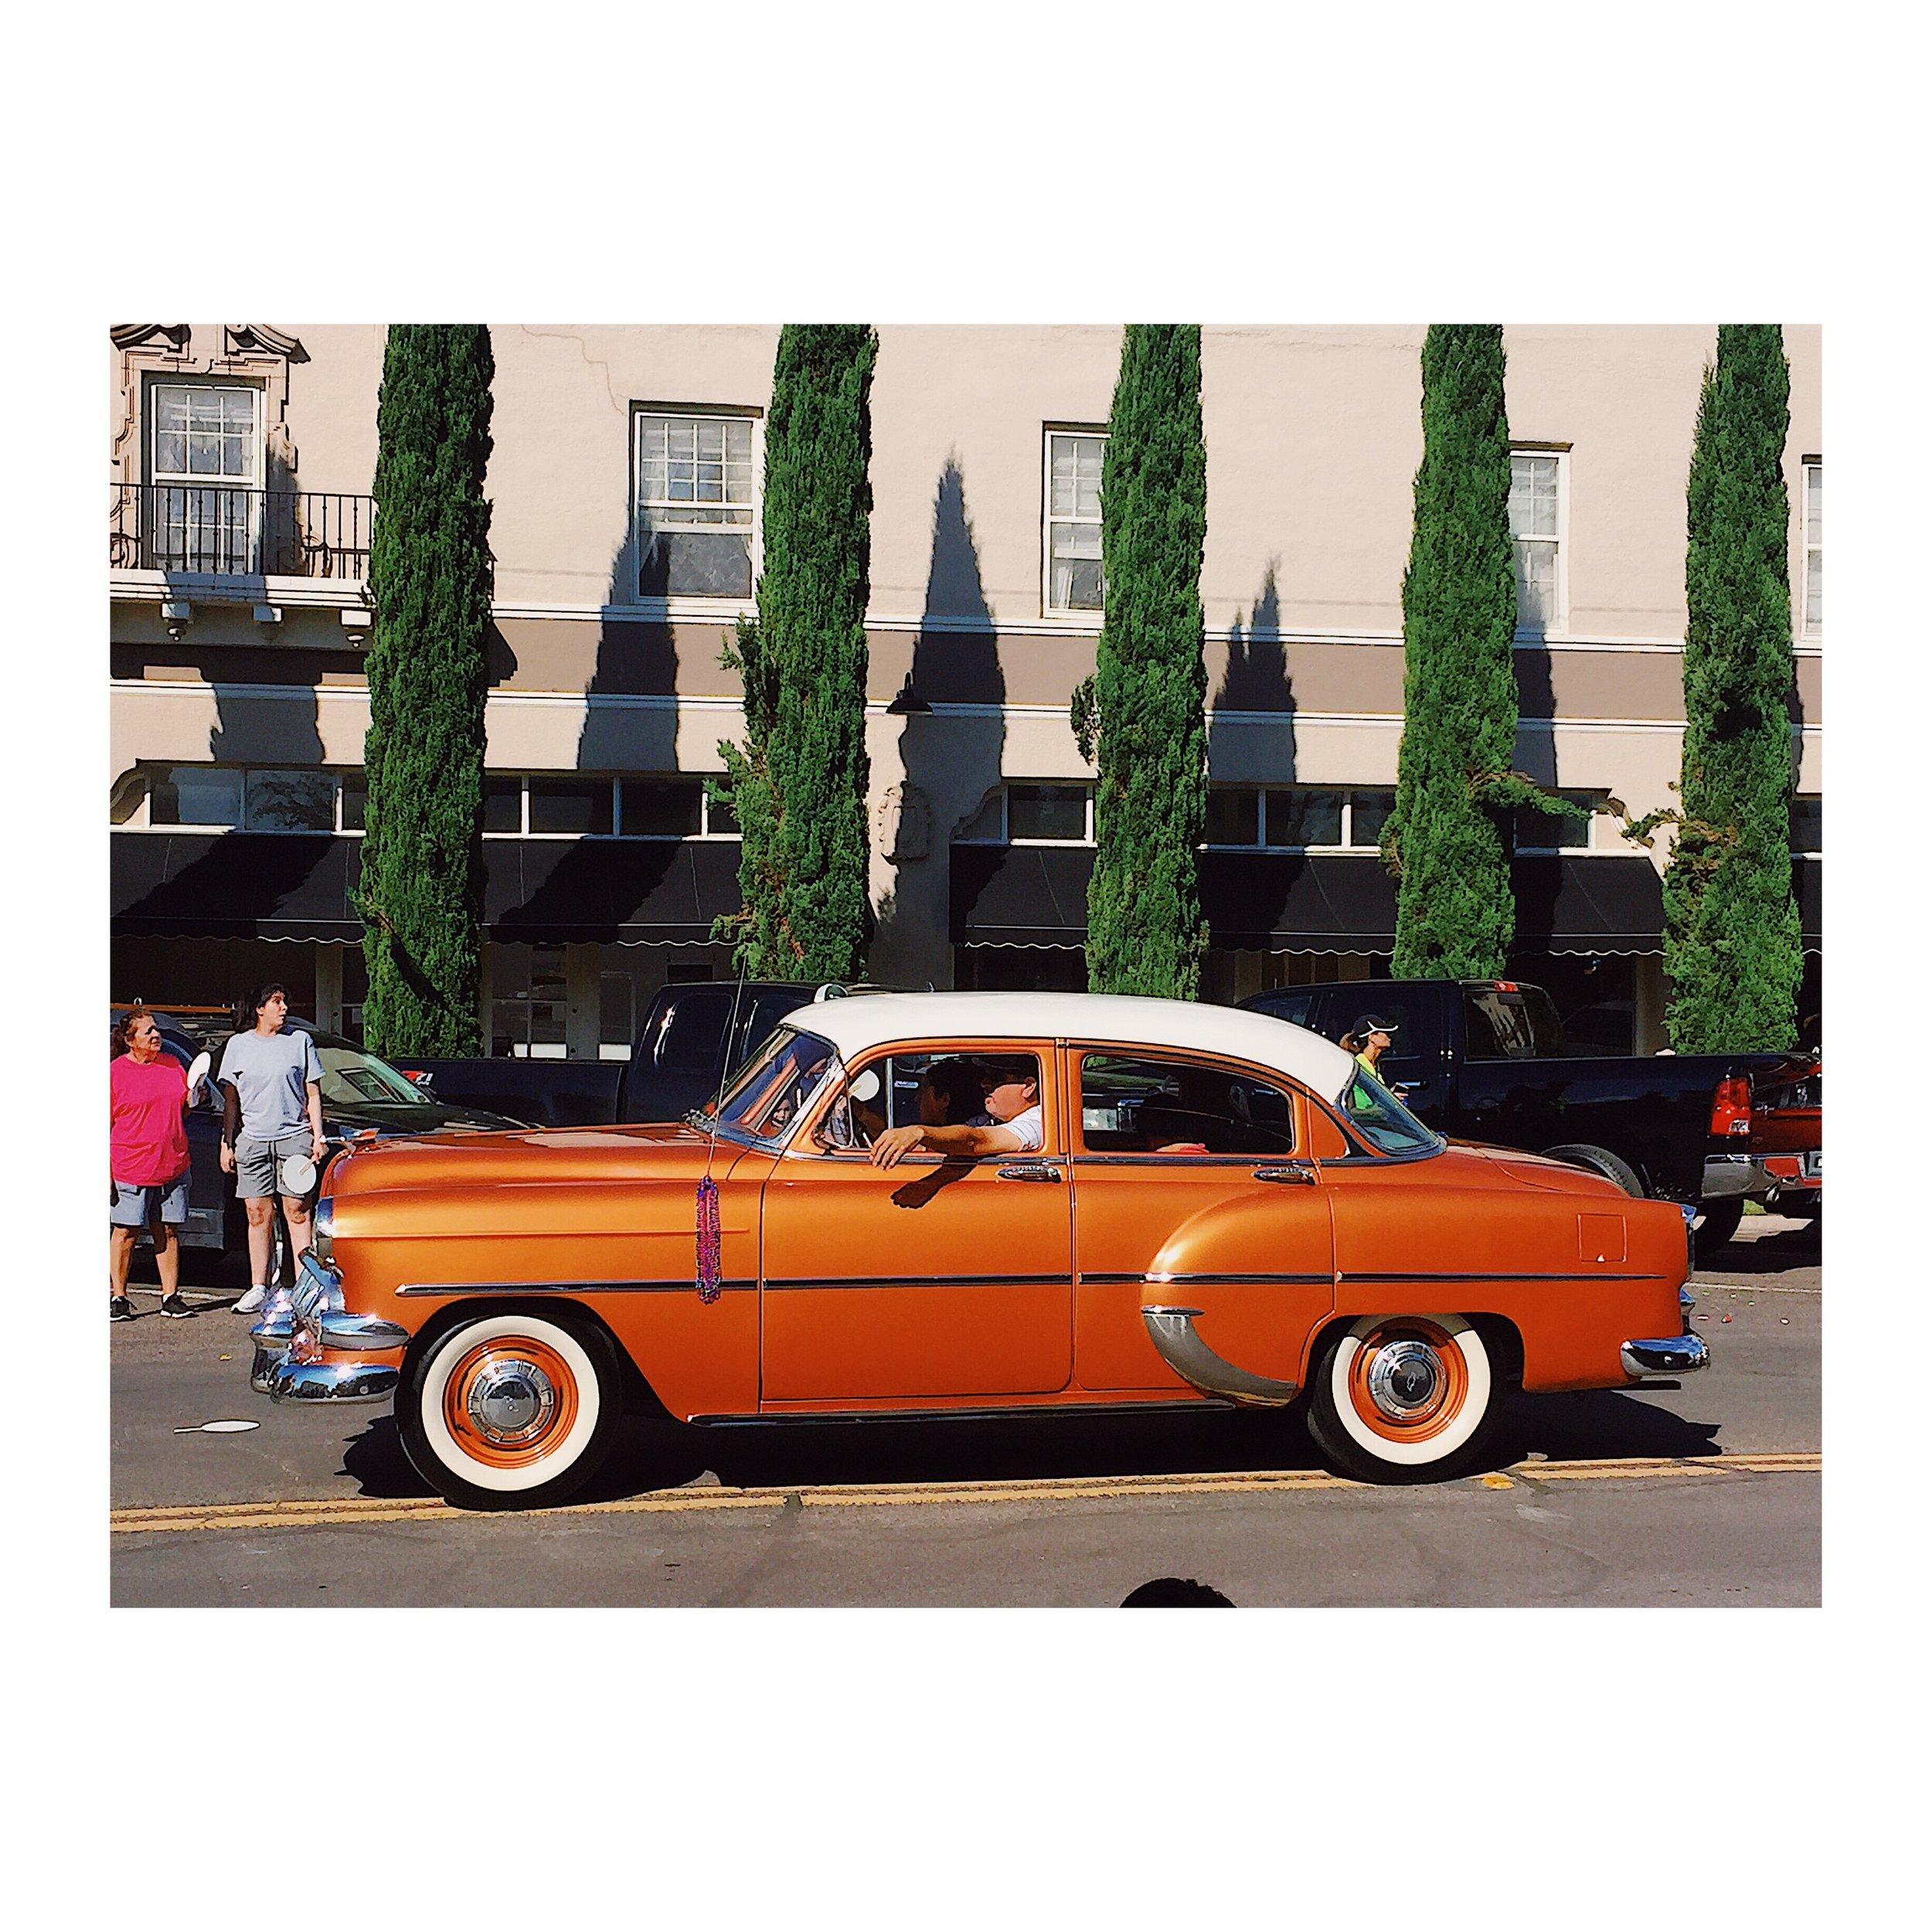 A car in the Marfa Ligths Festival Parade. Photo by Rodolfo Molina.